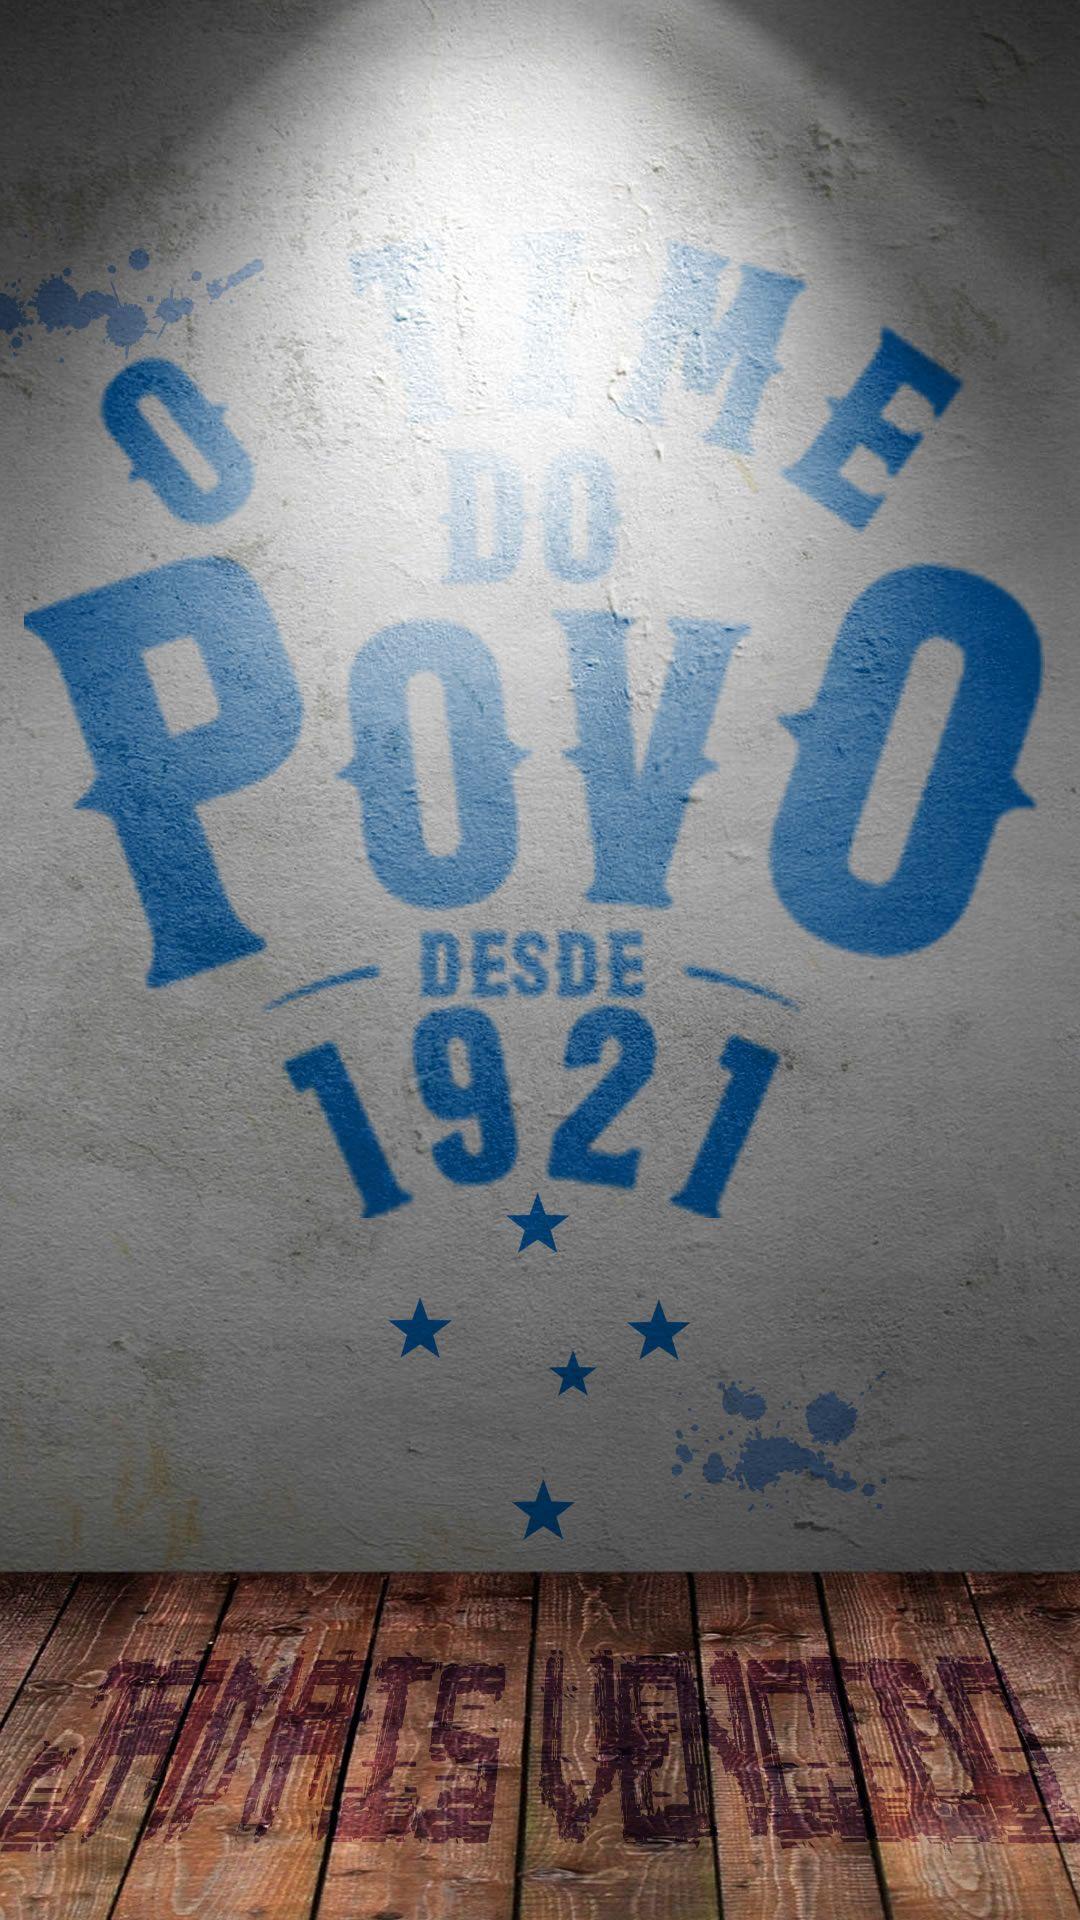 #Wallpaper #JamaisVencido #PalestraItália #CruzeiroTimeDoPovo #OTimeDoPovo #Cruzeiro #CruzeiroEsporteClube #ChinaAzul #FechadoComOCruzeiro #Futebol #Soccer #BeloHorizonte #MinasGerais #Brasil #Brazil